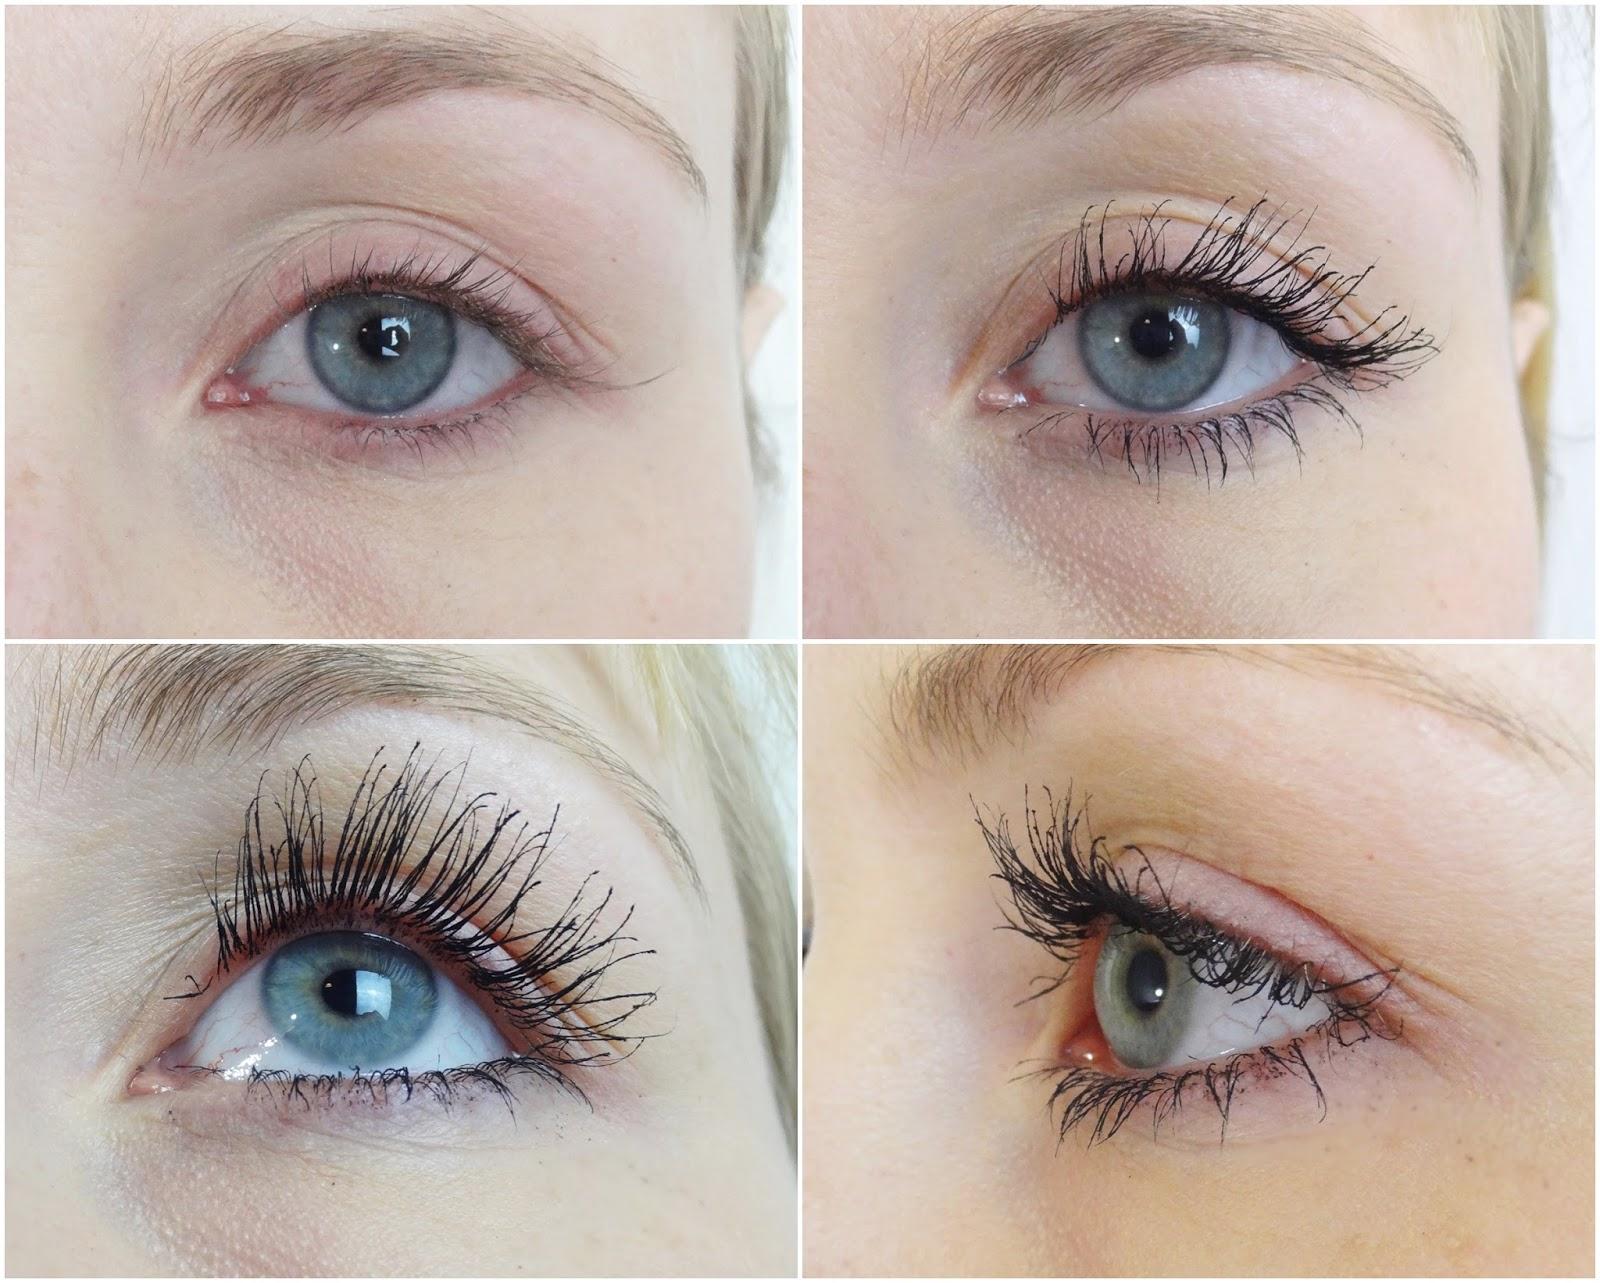 Bobbi Brown - Smokey Eye Mascara Pretty Clover Beautyblog Mascara Test Review